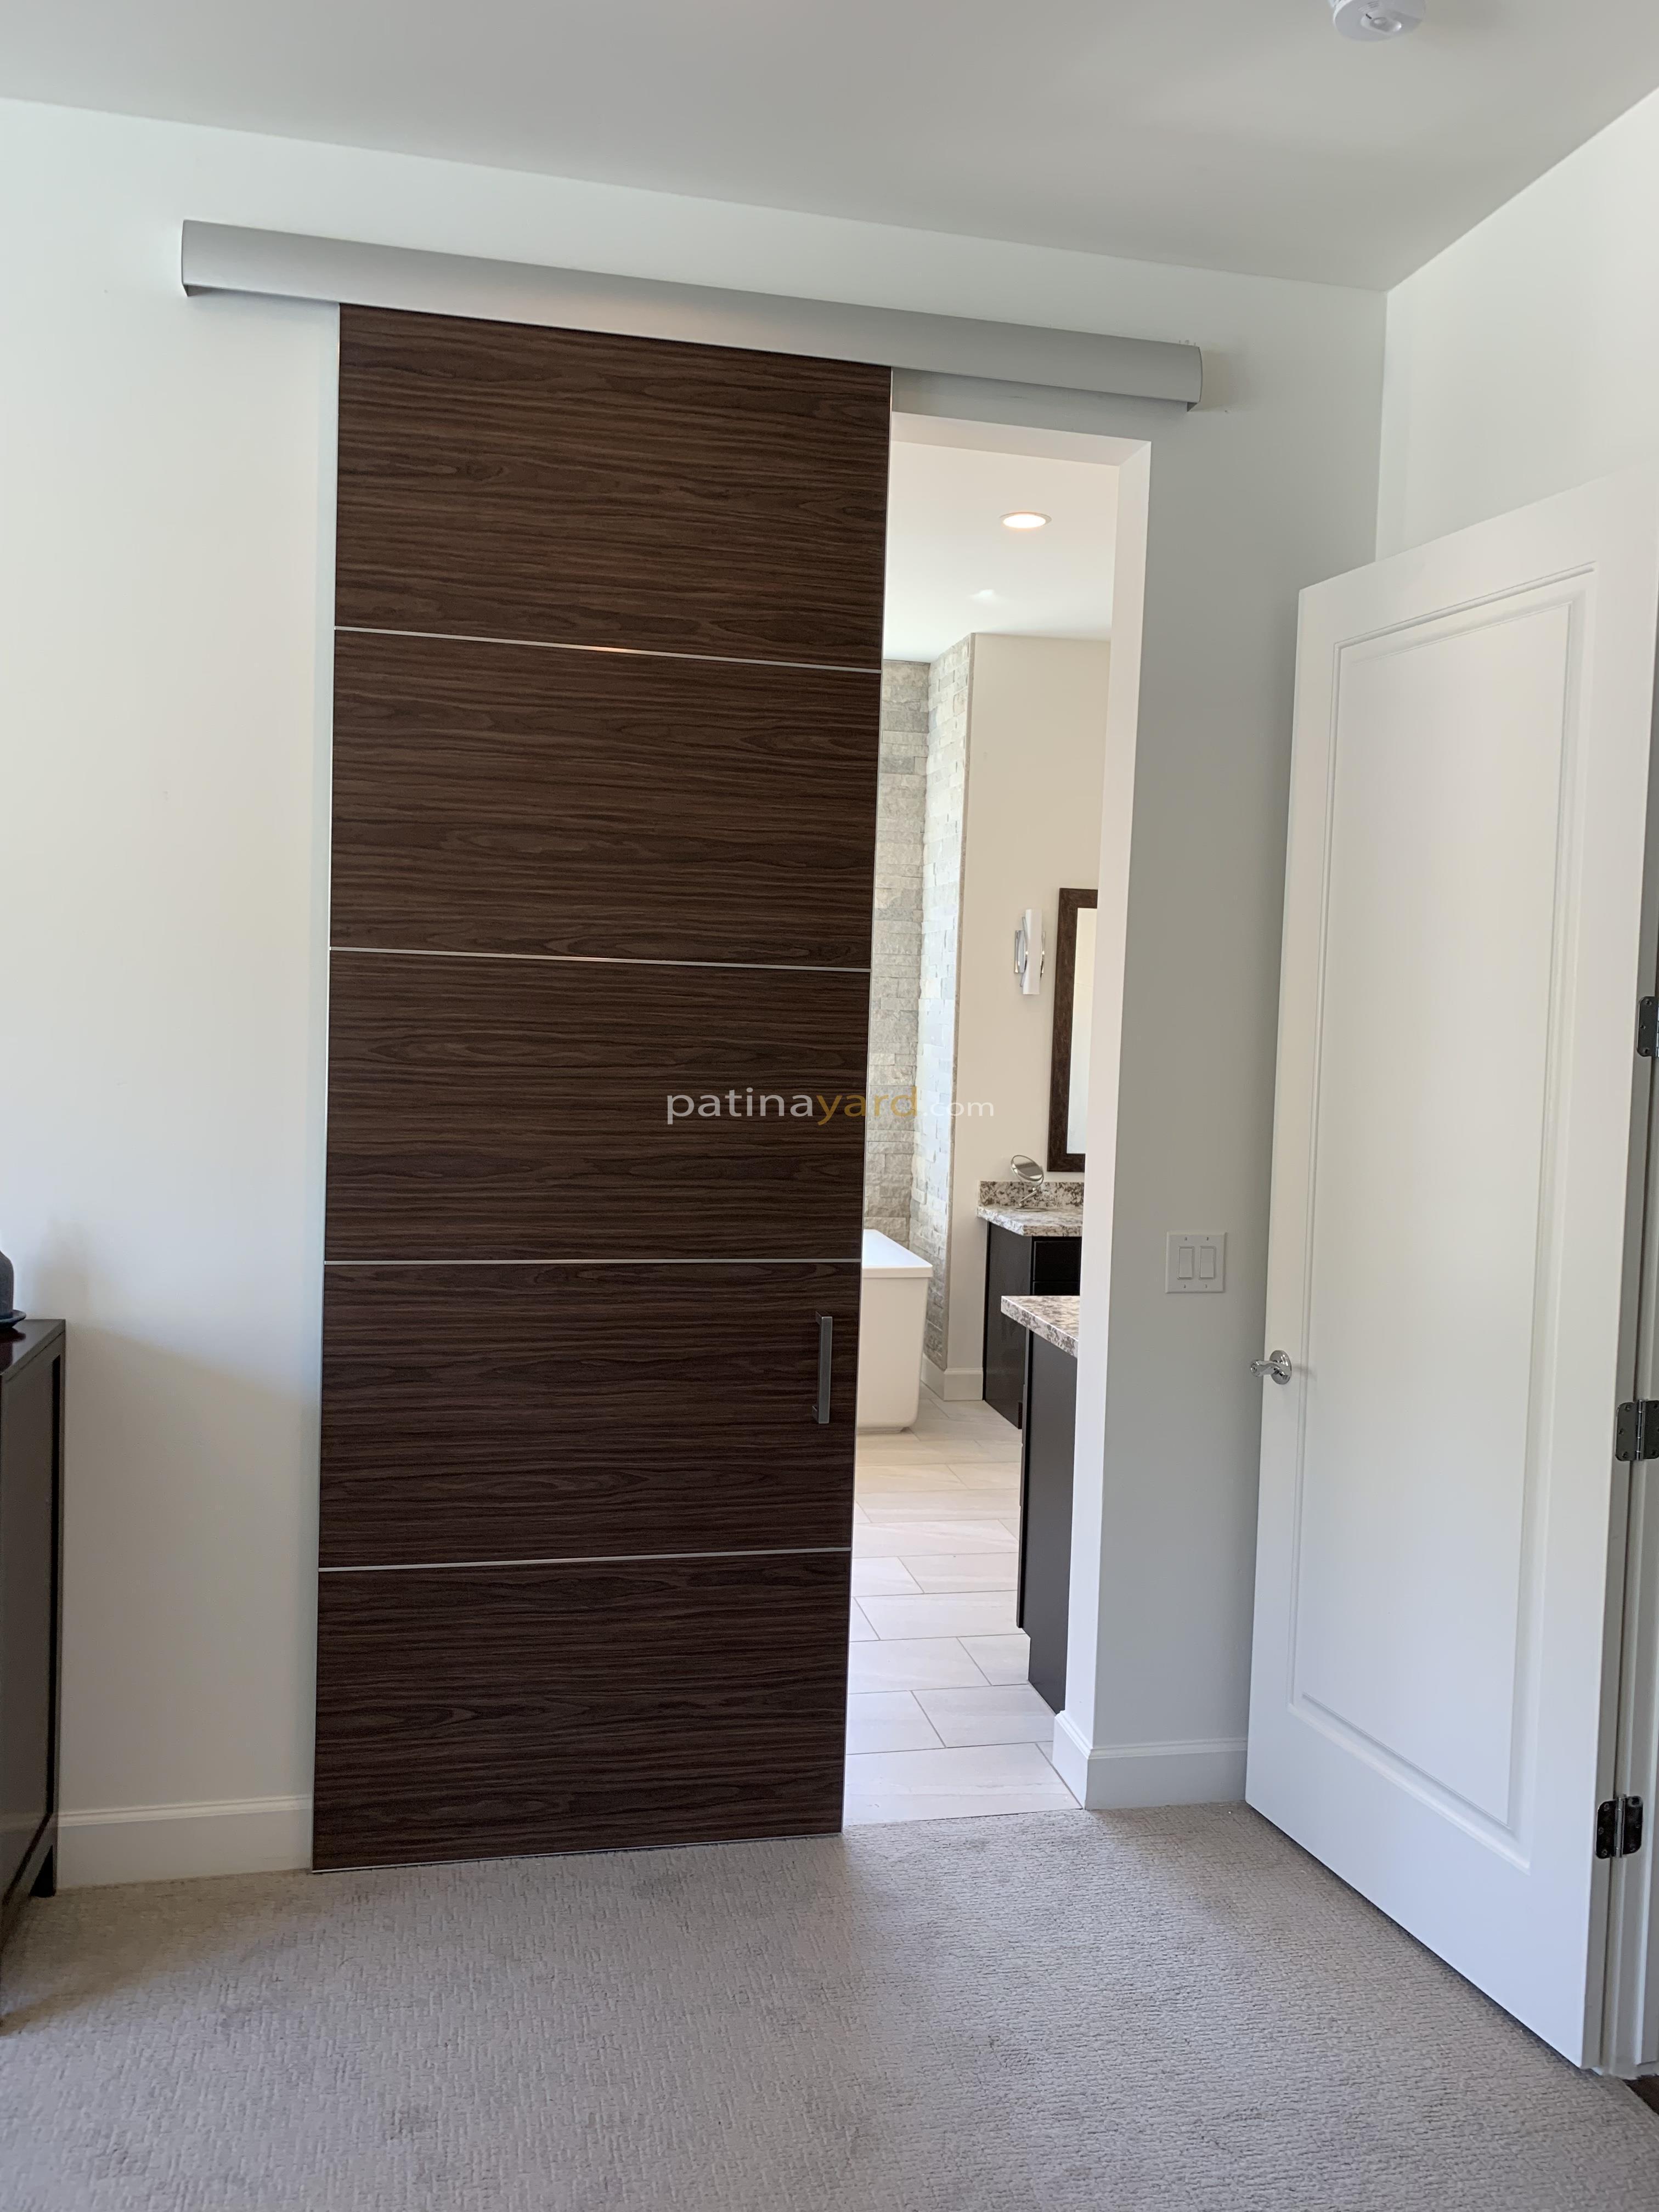 Bella laminate oak door with stainless seams